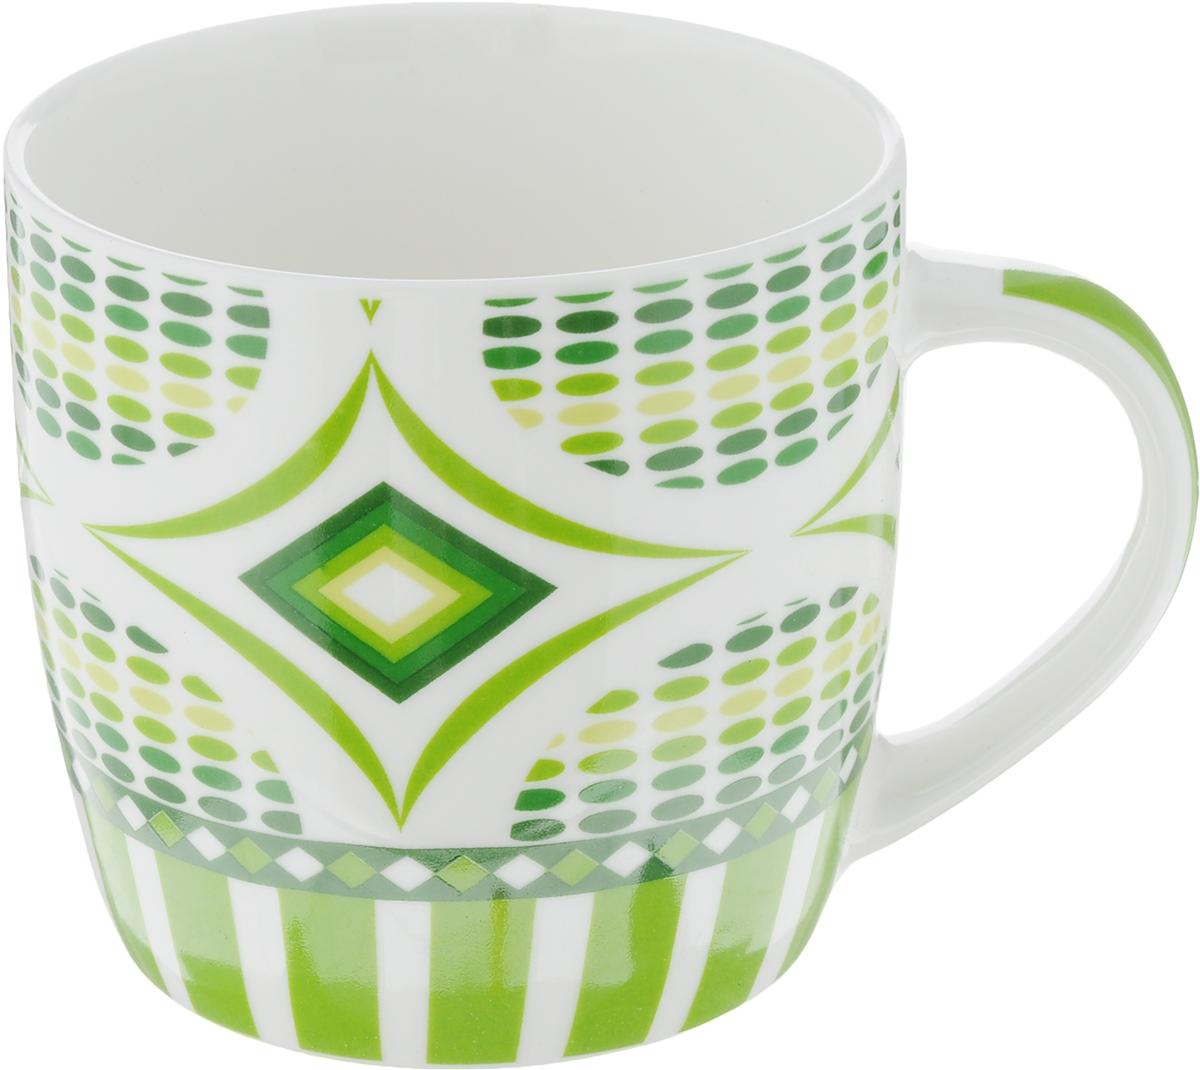 "Кружка ""Loraine"", цвет: белый, зеленый, салатовый, 320 мл. 24475"